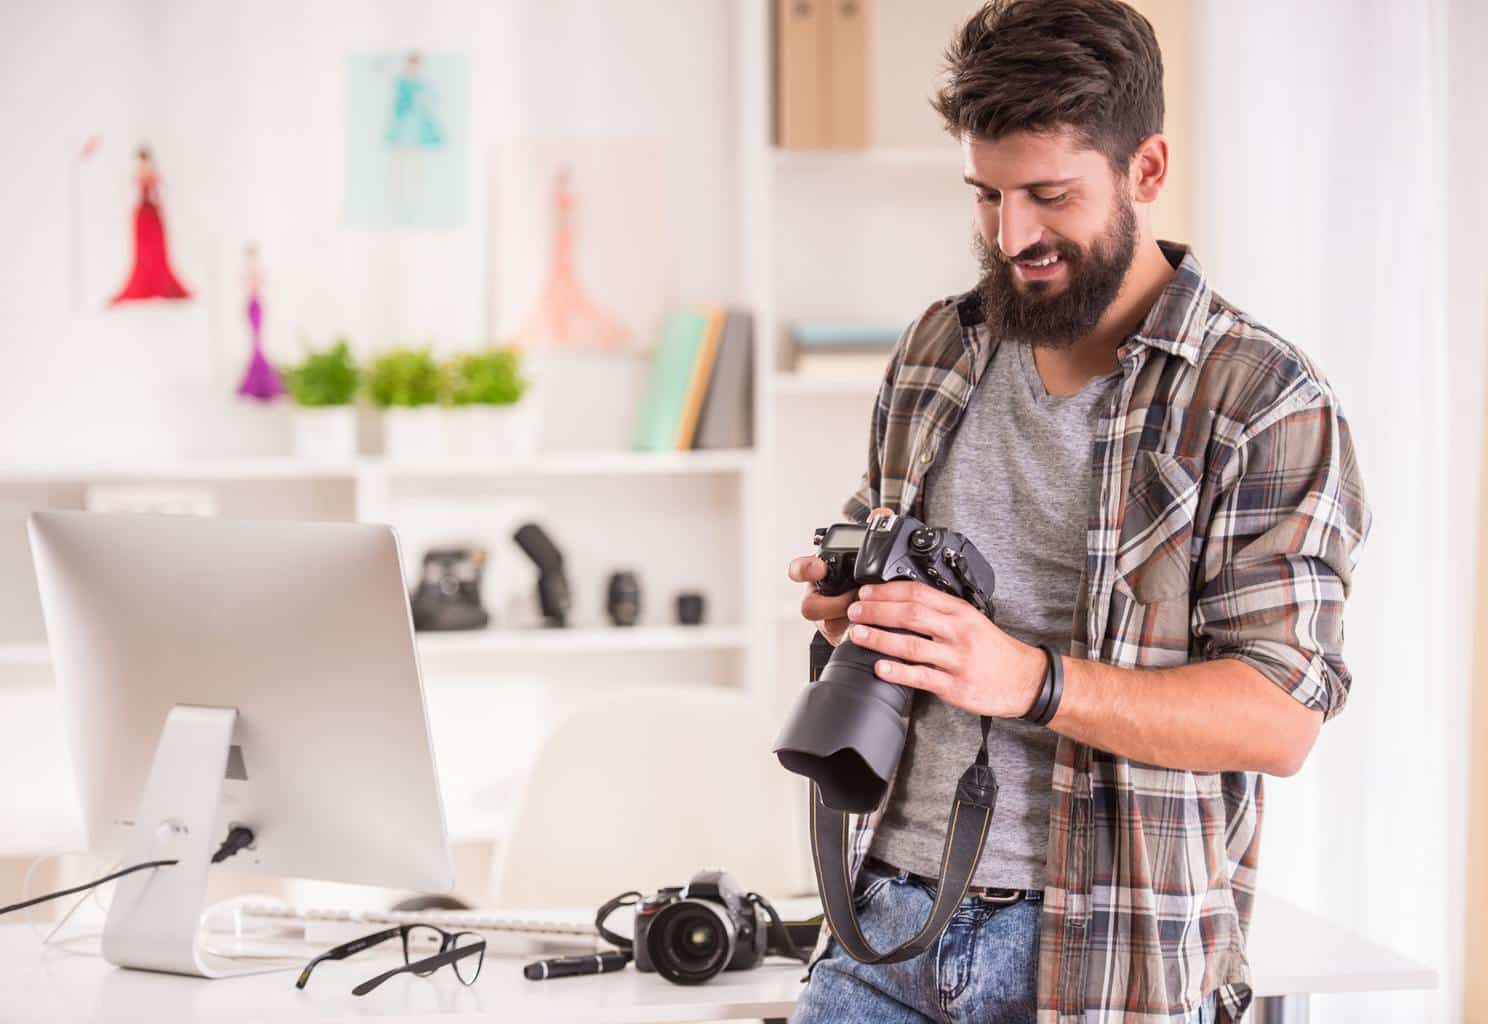 Photographer resume